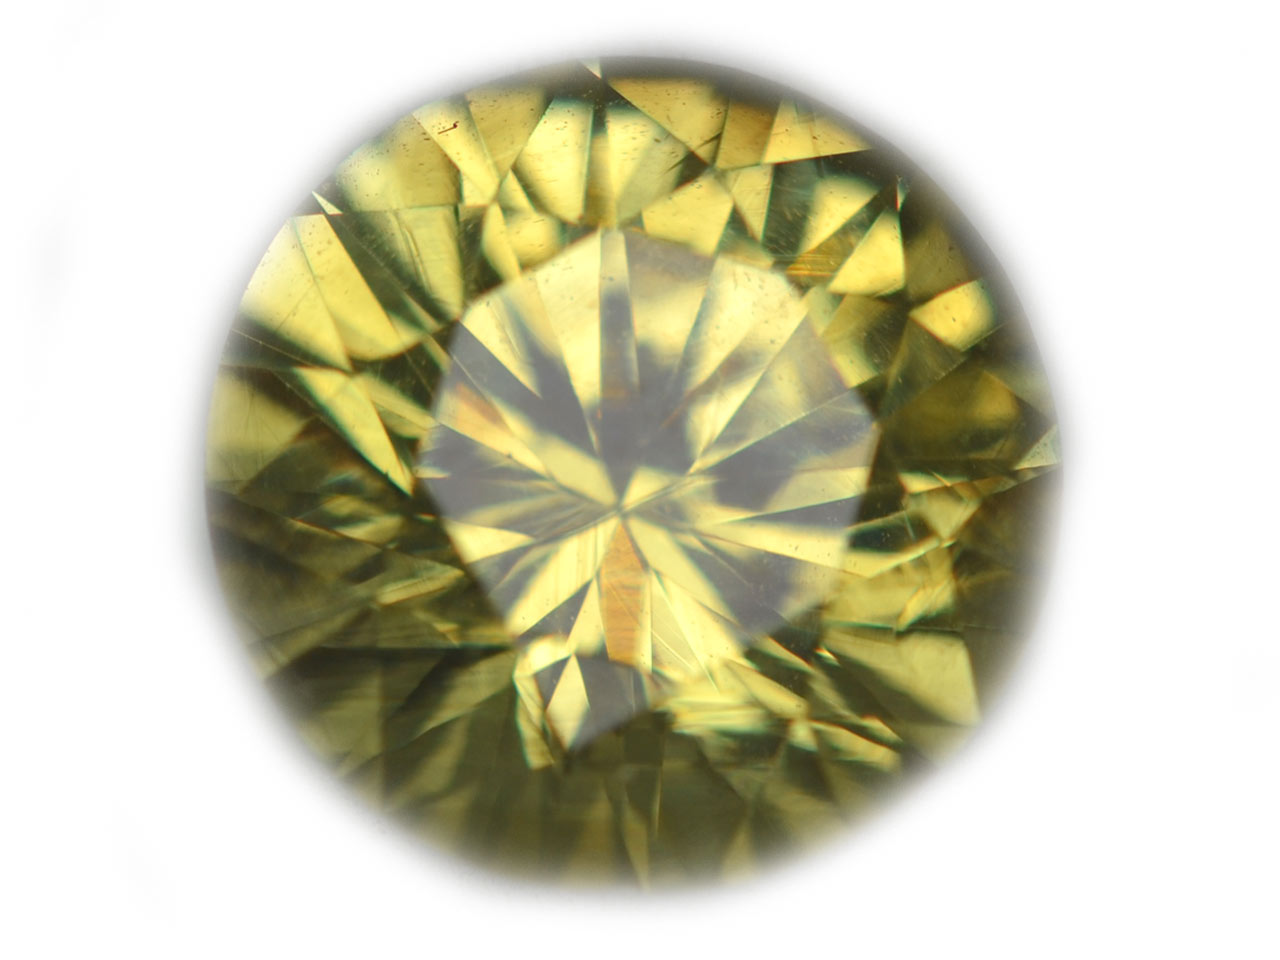 Ceylon Green Round Brilliant Chrysoberyl - 2.83 cts - 8.8x8.8x5.8mm